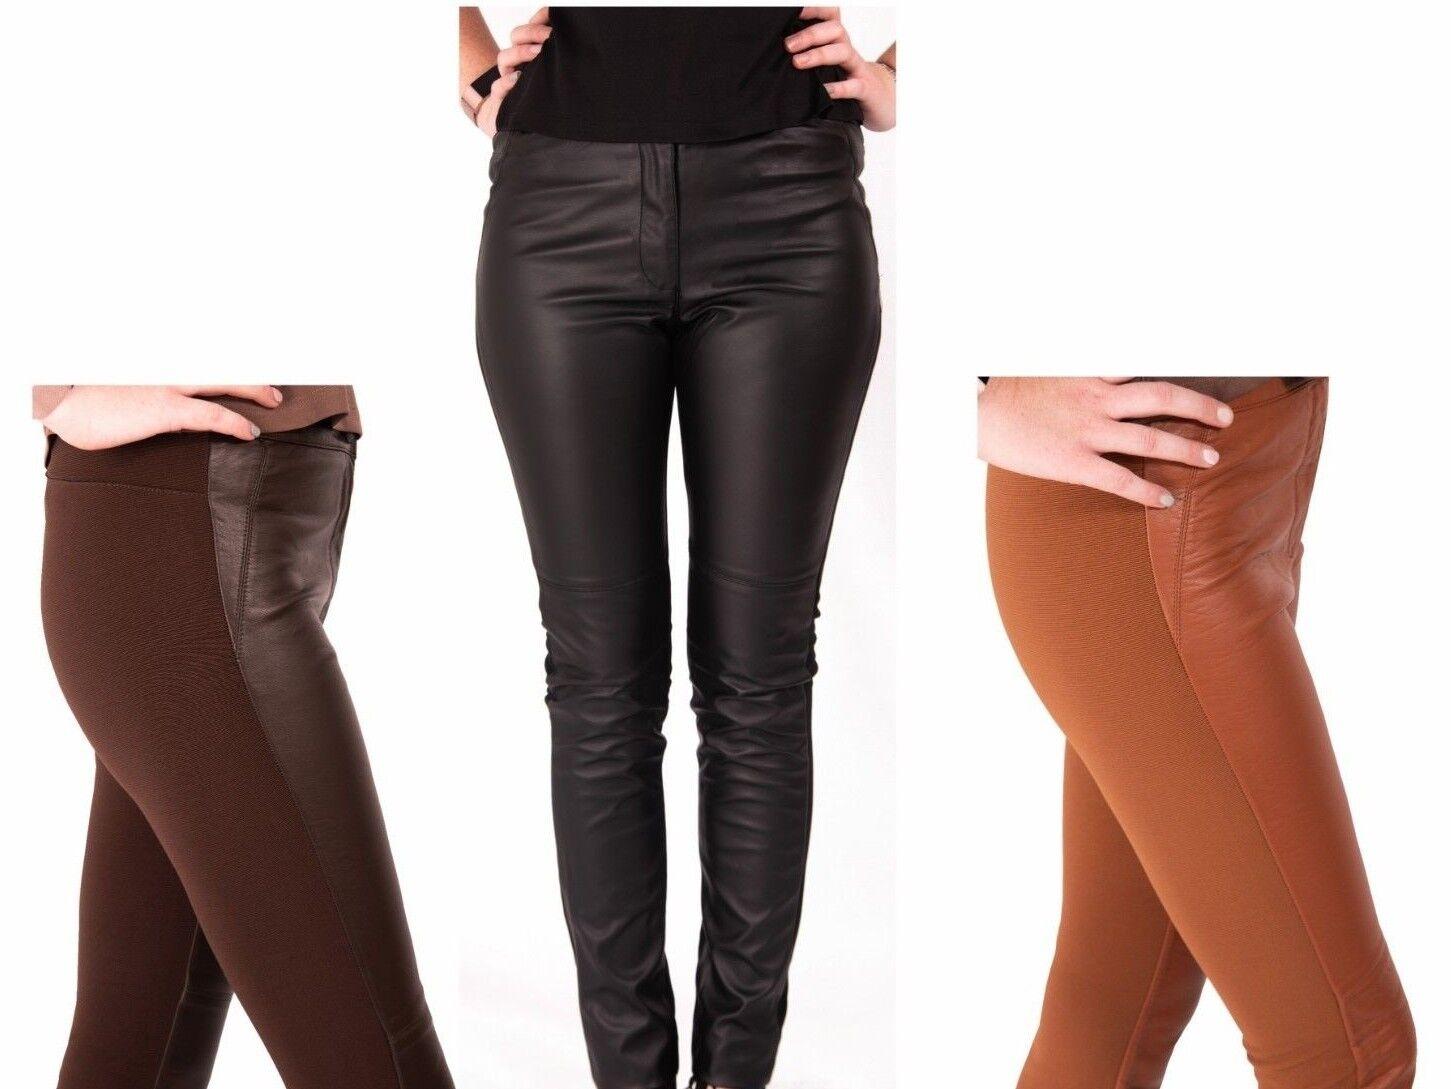 neînvins x en-gros online magazin oficial Leather Look Leggings Pantaloni Donna H&M i leggins 6-10 NUOVA Moda Skinny  | eBay